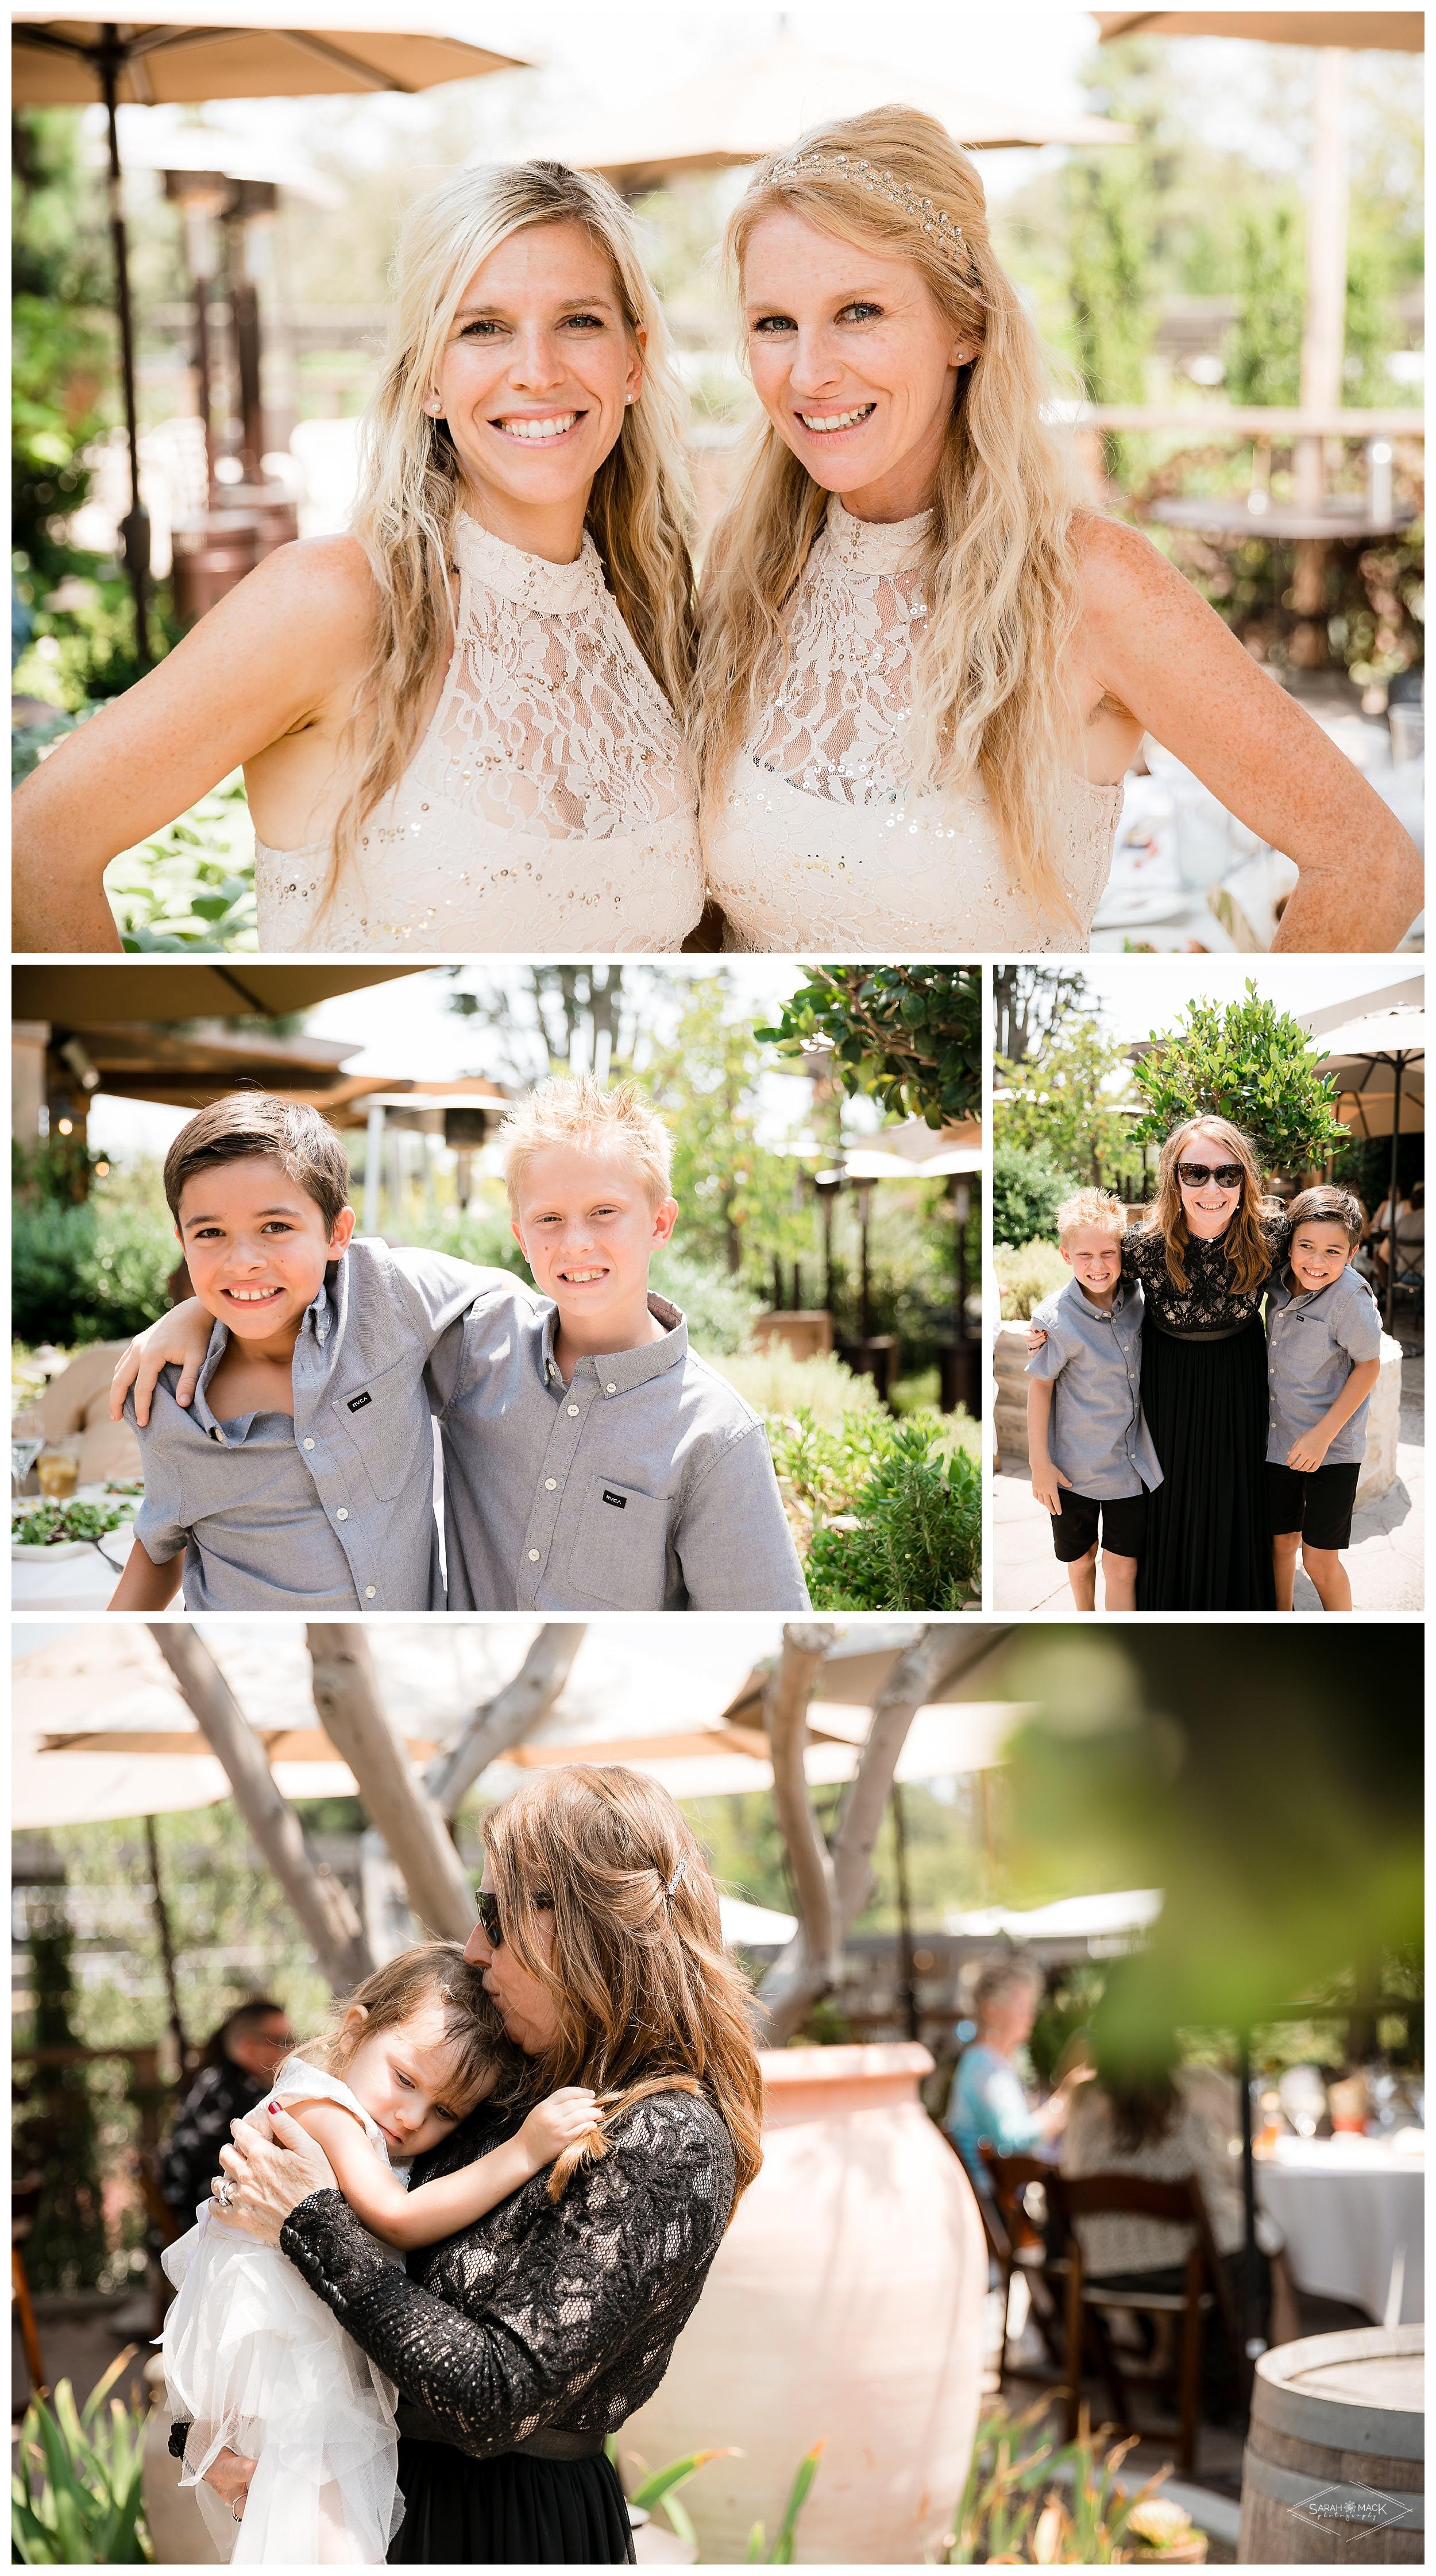 LM-Newport-Beach-Pier-Intimate-Wedding-Photography 234.jpg